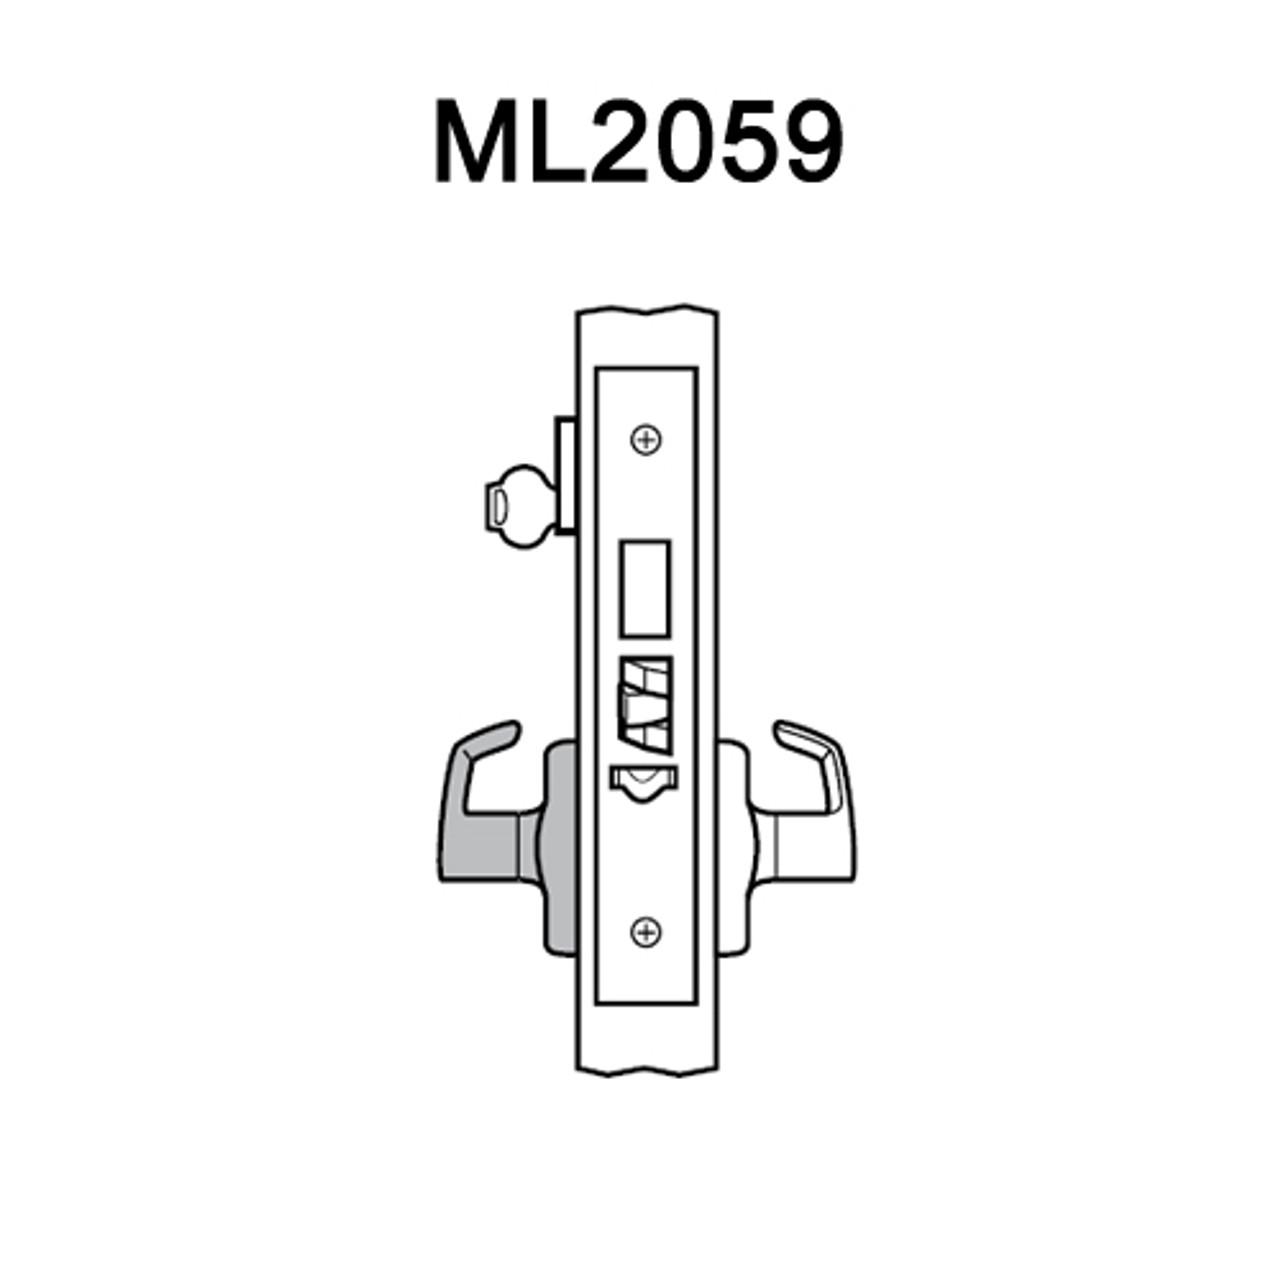 ML2059-CSM-605-M31 Corbin Russwin ML2000 Series Mortise Security Storeroom Trim Pack with Citation Lever in Bright Brass